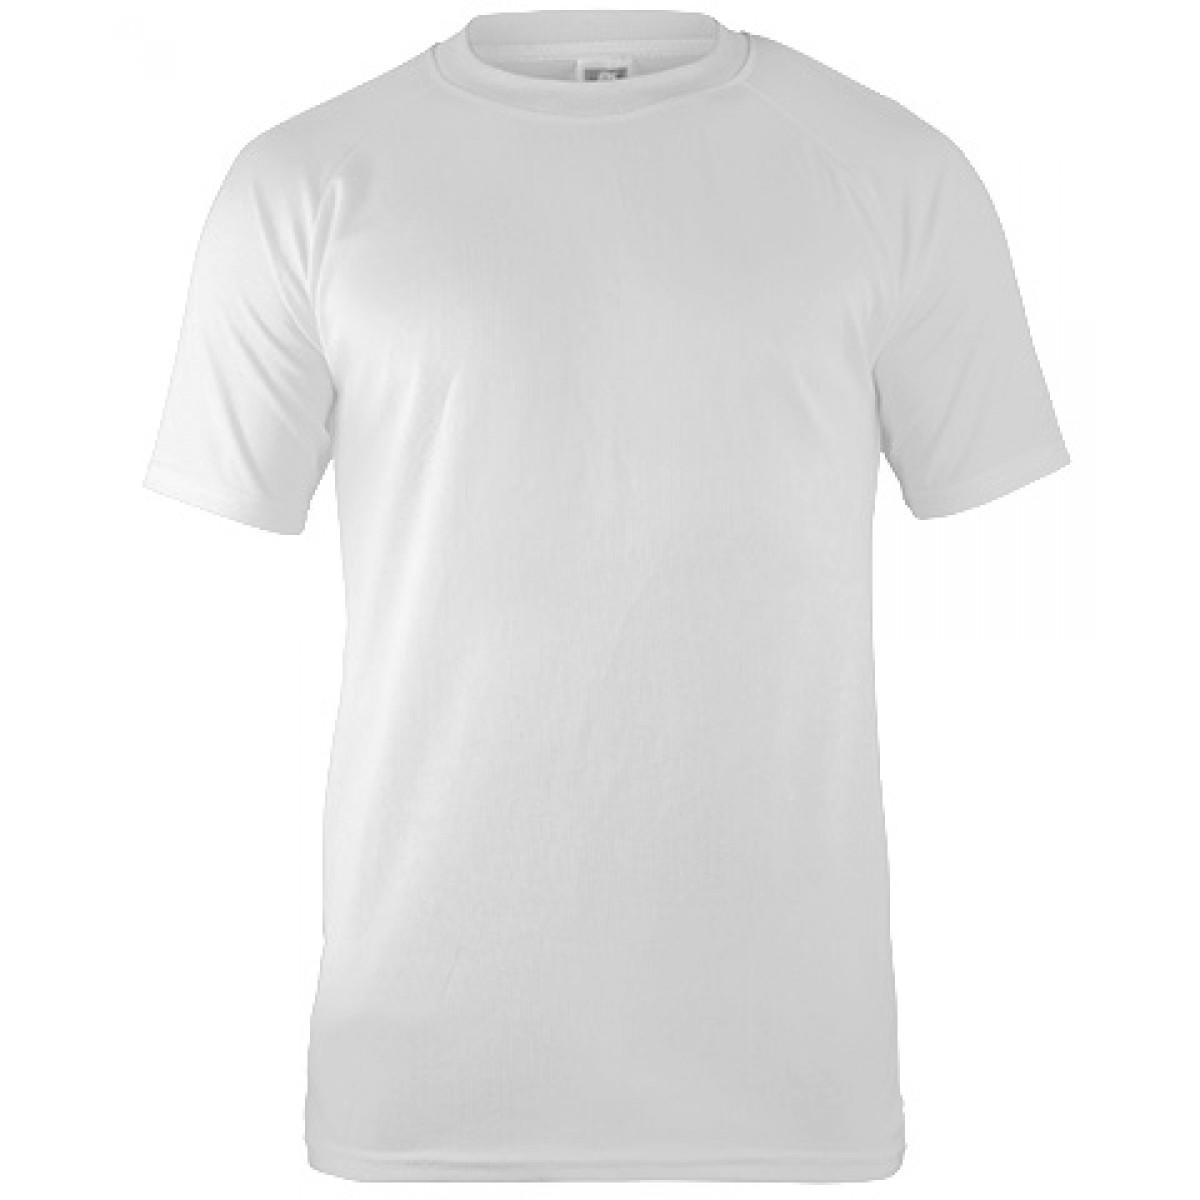 Short Sleeves Mesh Performance T-shirt-White-YL